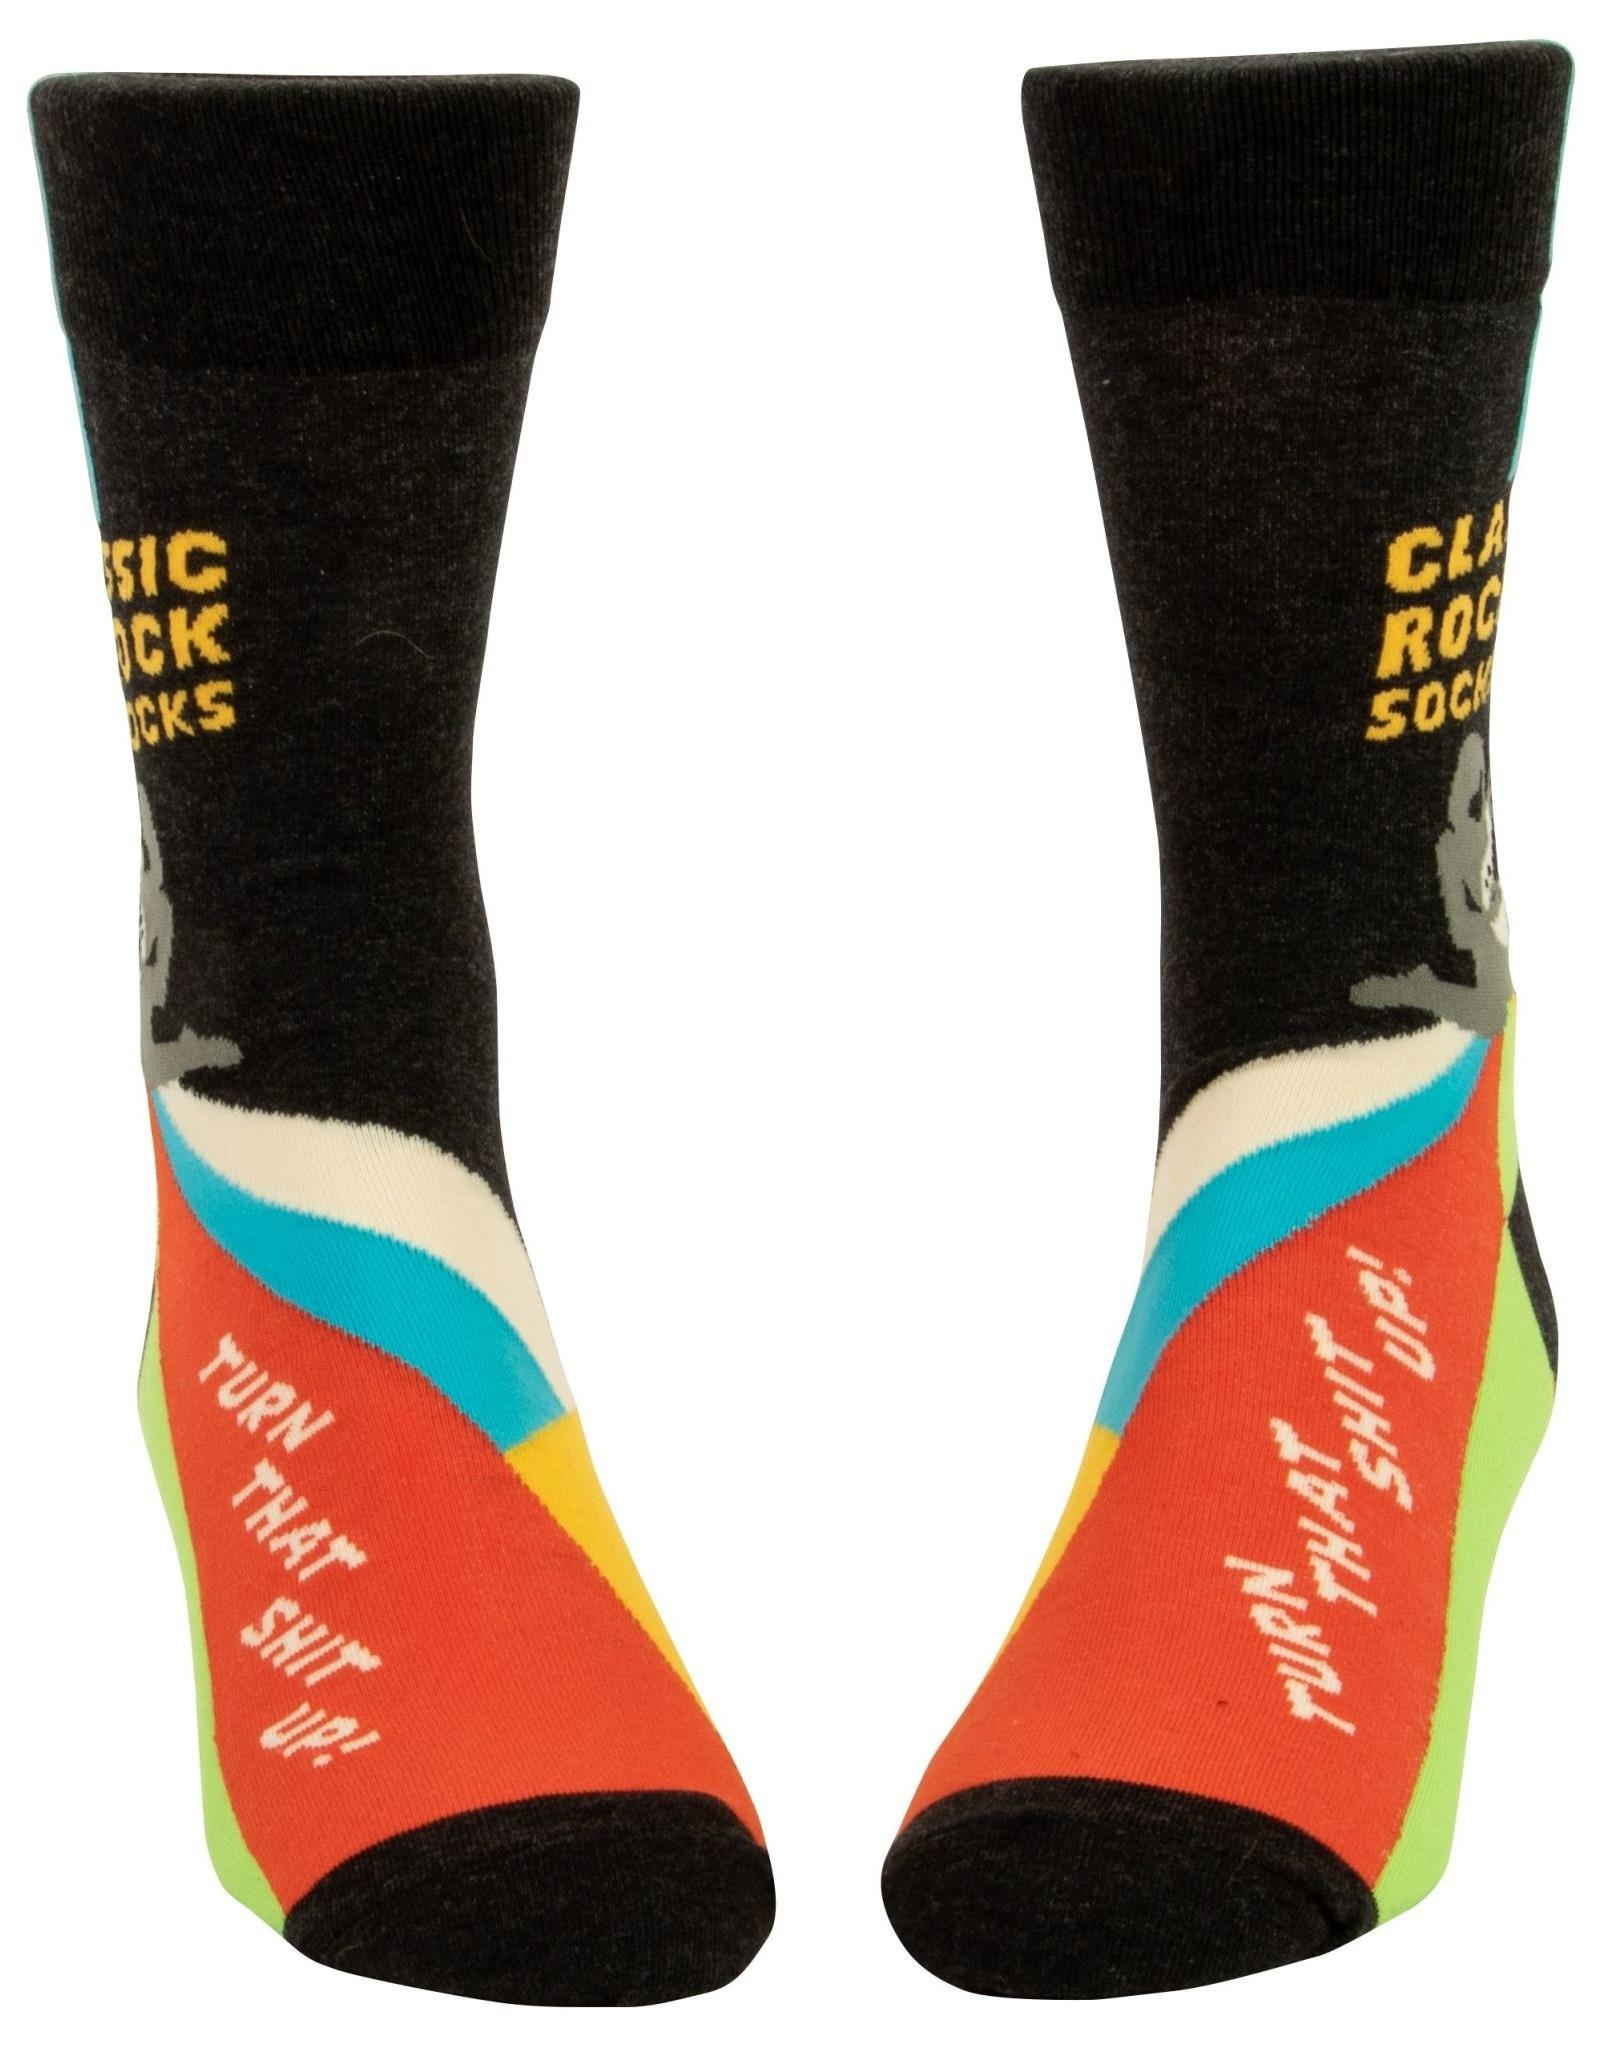 BlueQ Classic Rock Men's Socks